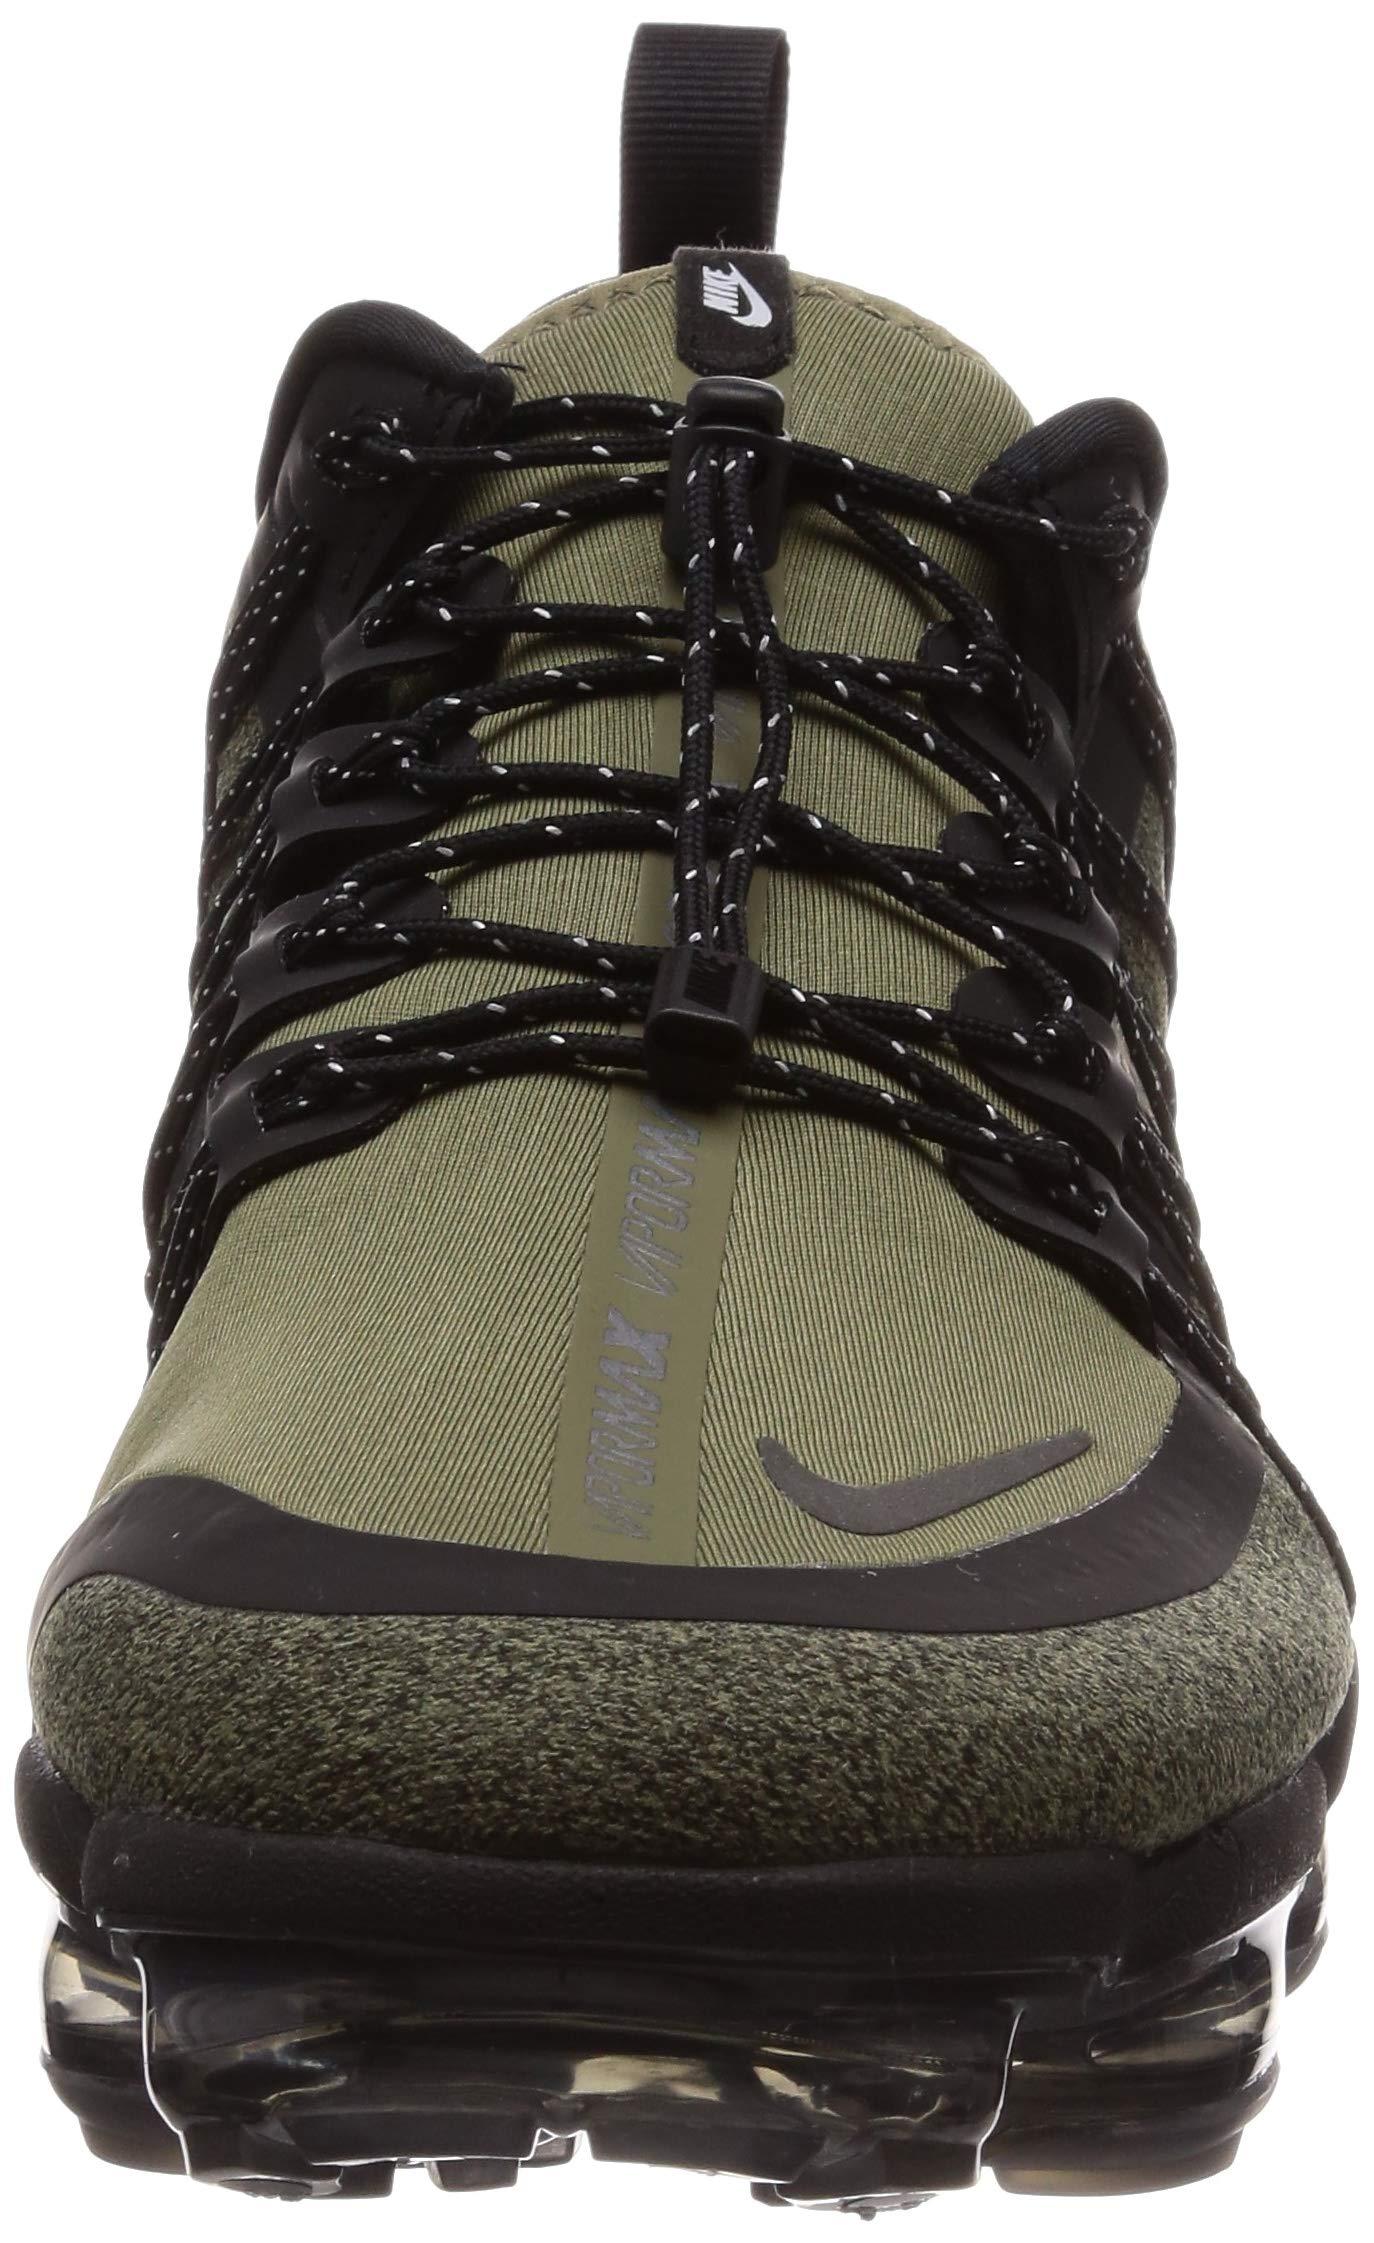 81PCU%2BHdpvL - Nike Men's Air Vapormax Run Utility, Medium Olive/Reflect Silver